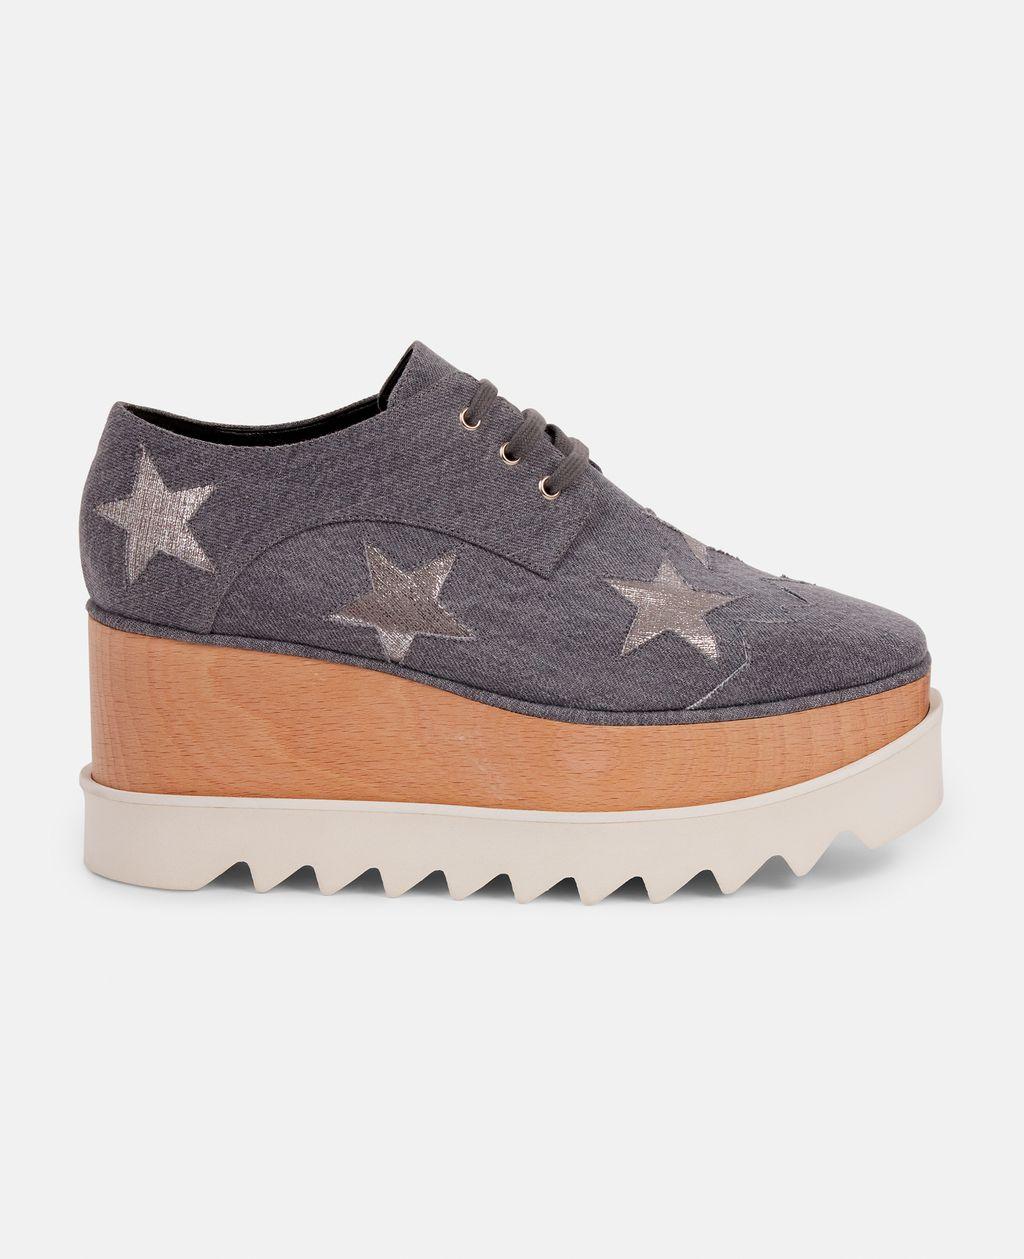 Stella McCartney Denim Shoes